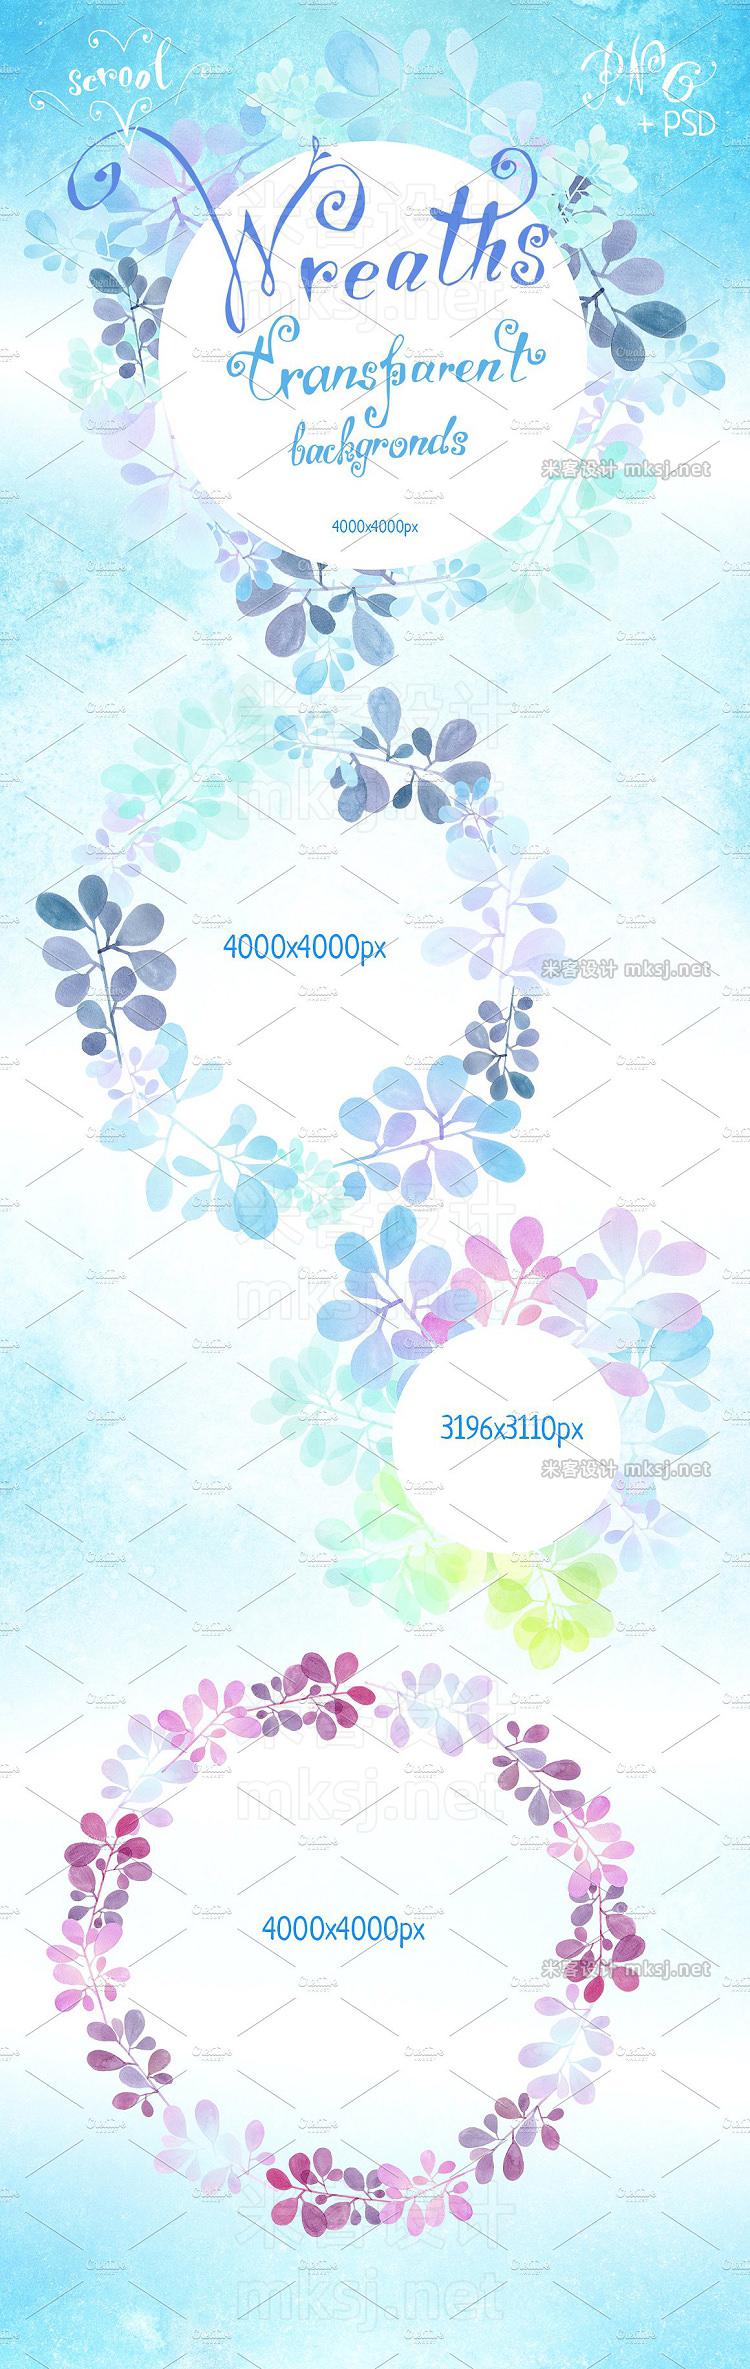 png素材 Watercolor twigs set